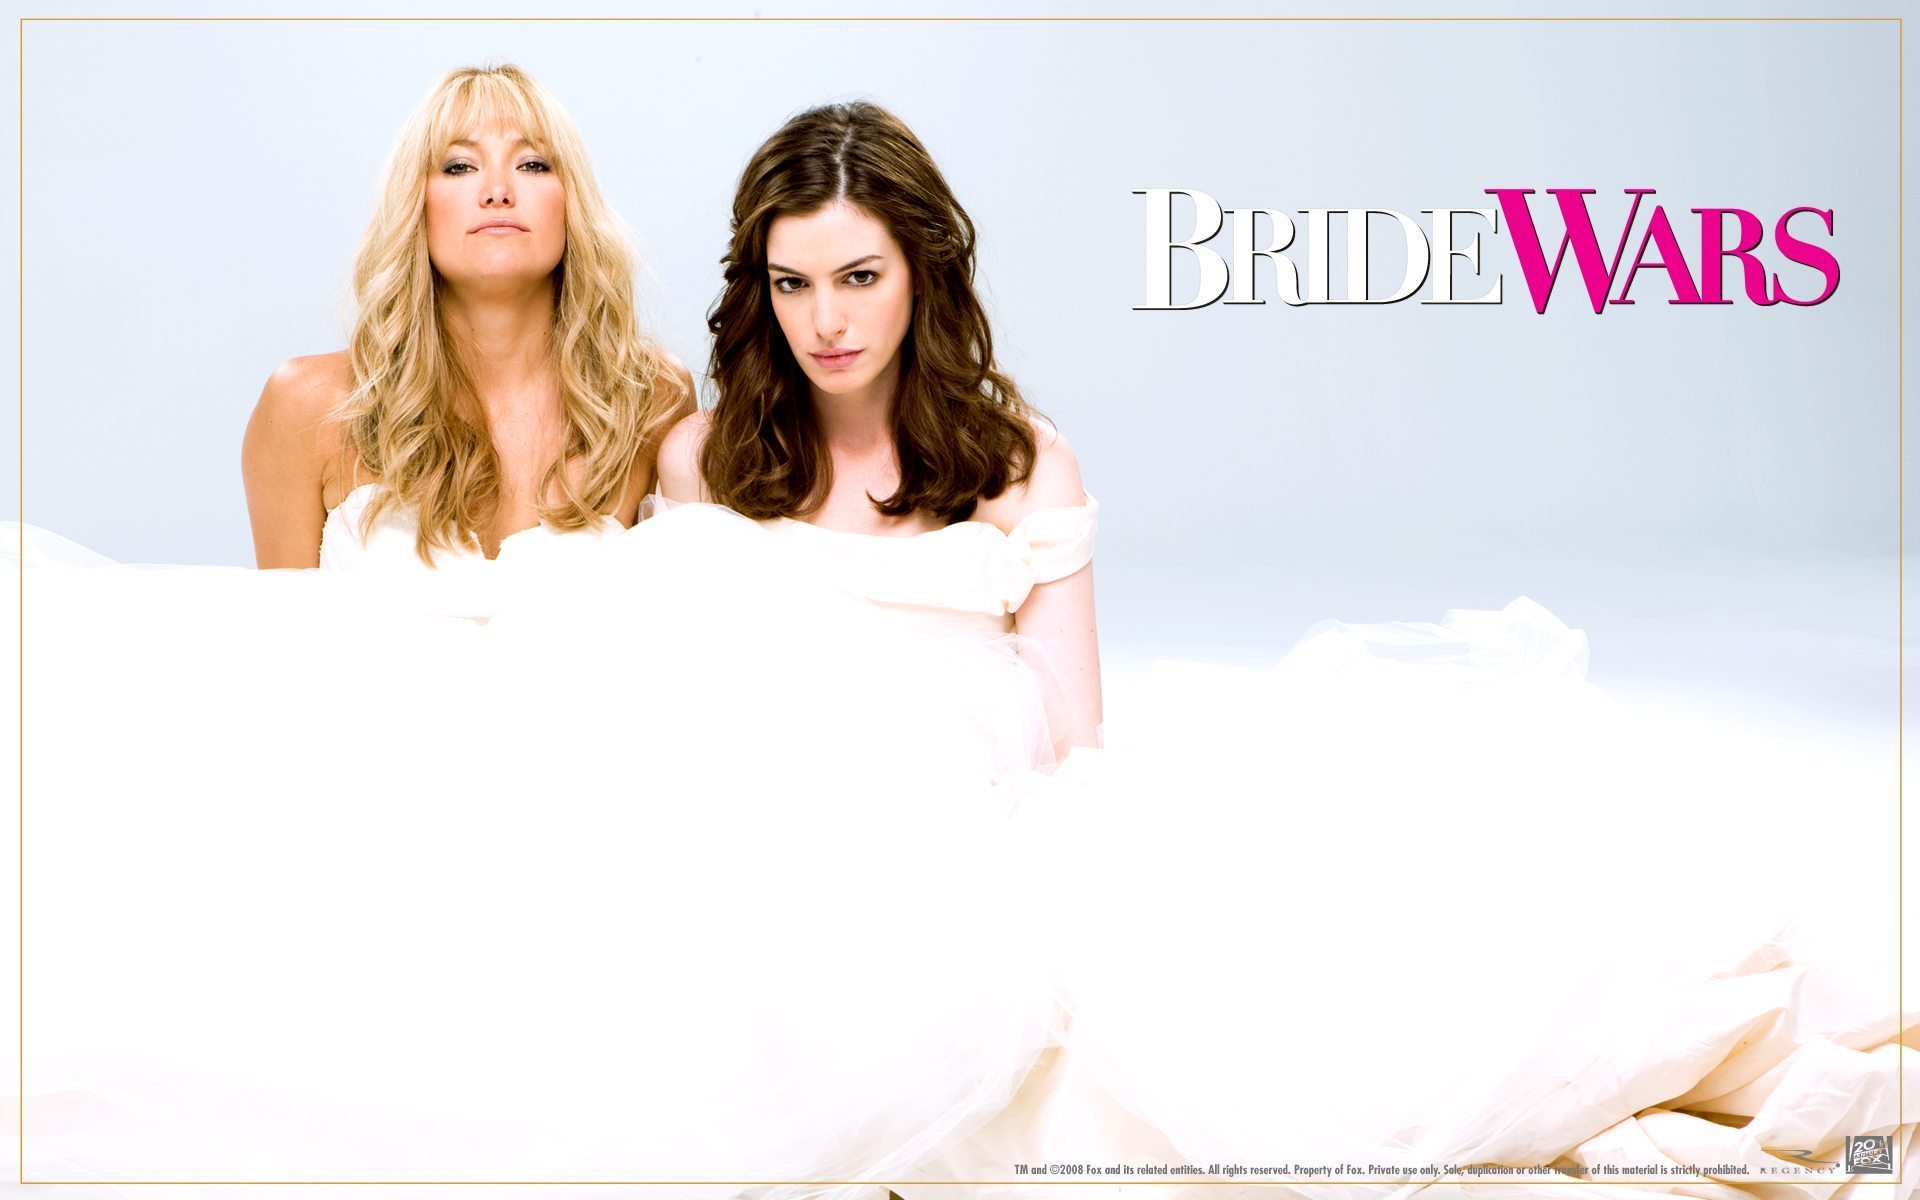 Bride Wars Bride Wars Wallpaper 6852524 Fanpop